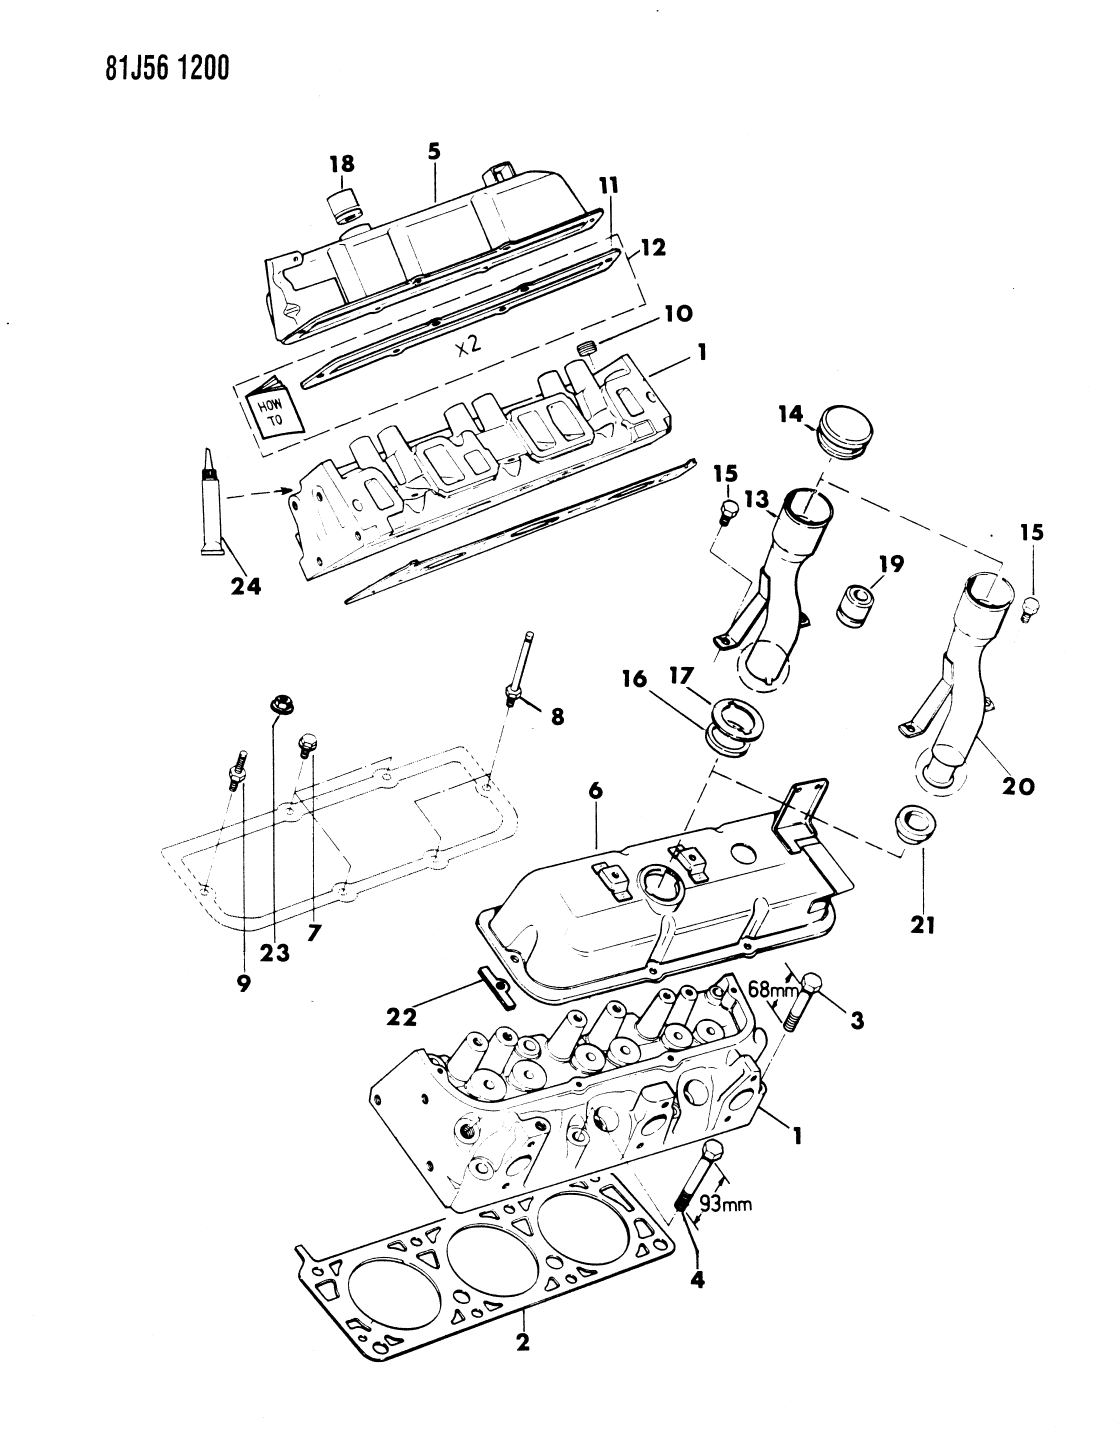 1984 Jeep Cherokee Cylinder Head Mopar Parts Giant 4 0l Engine Bellhousing Diagram Thumbnail 1